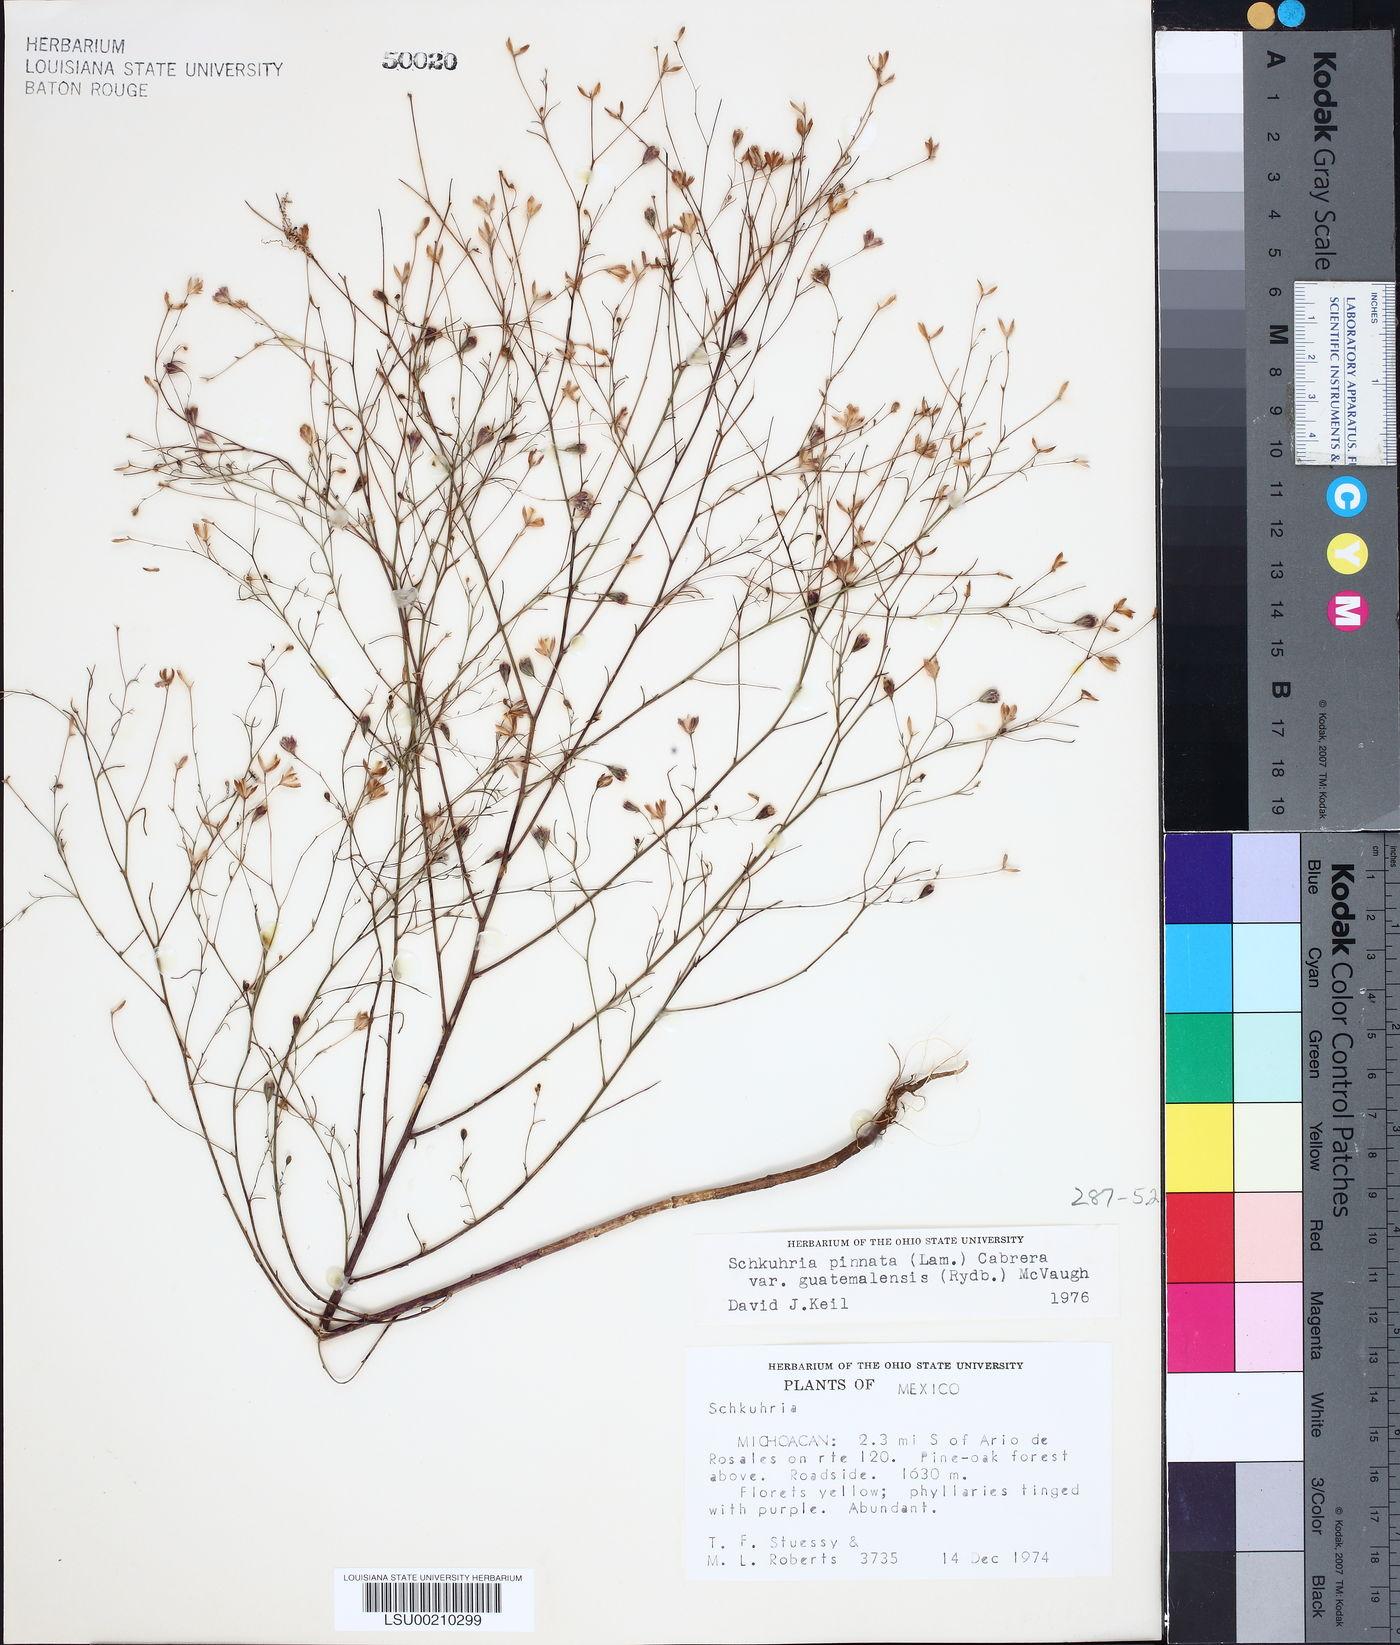 Schkuhria pinnata var. guatemalensis image